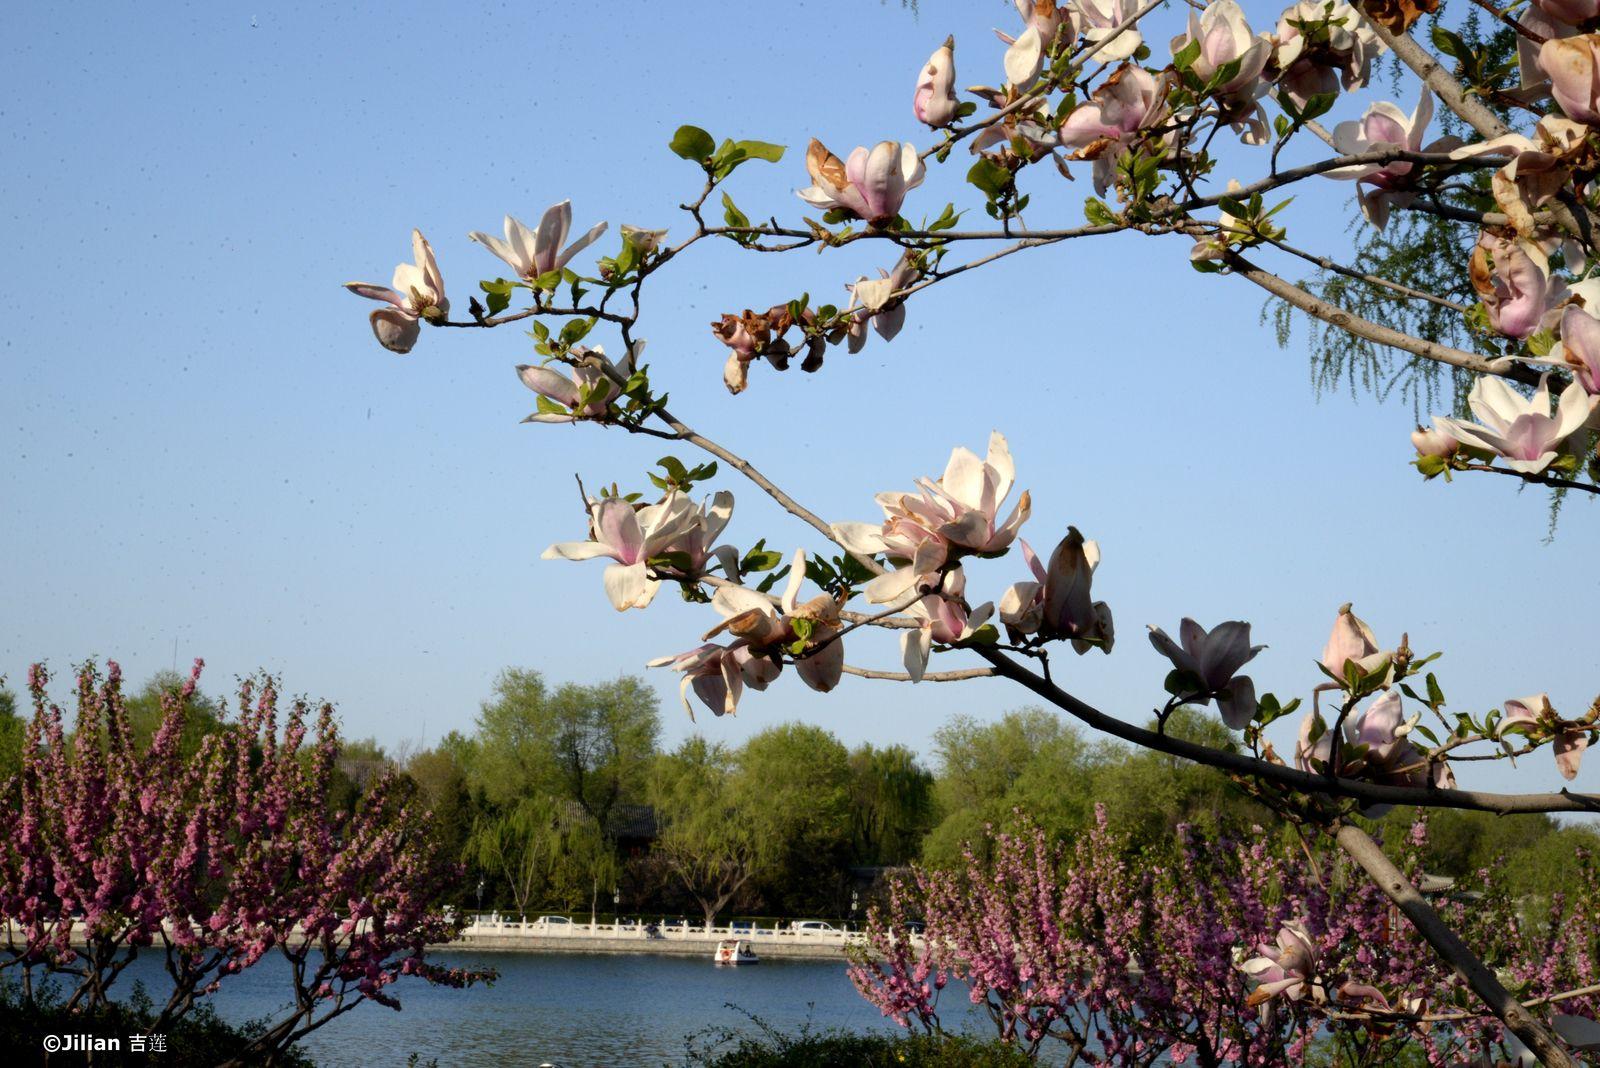 Beijing en fleurs - 北京花开了